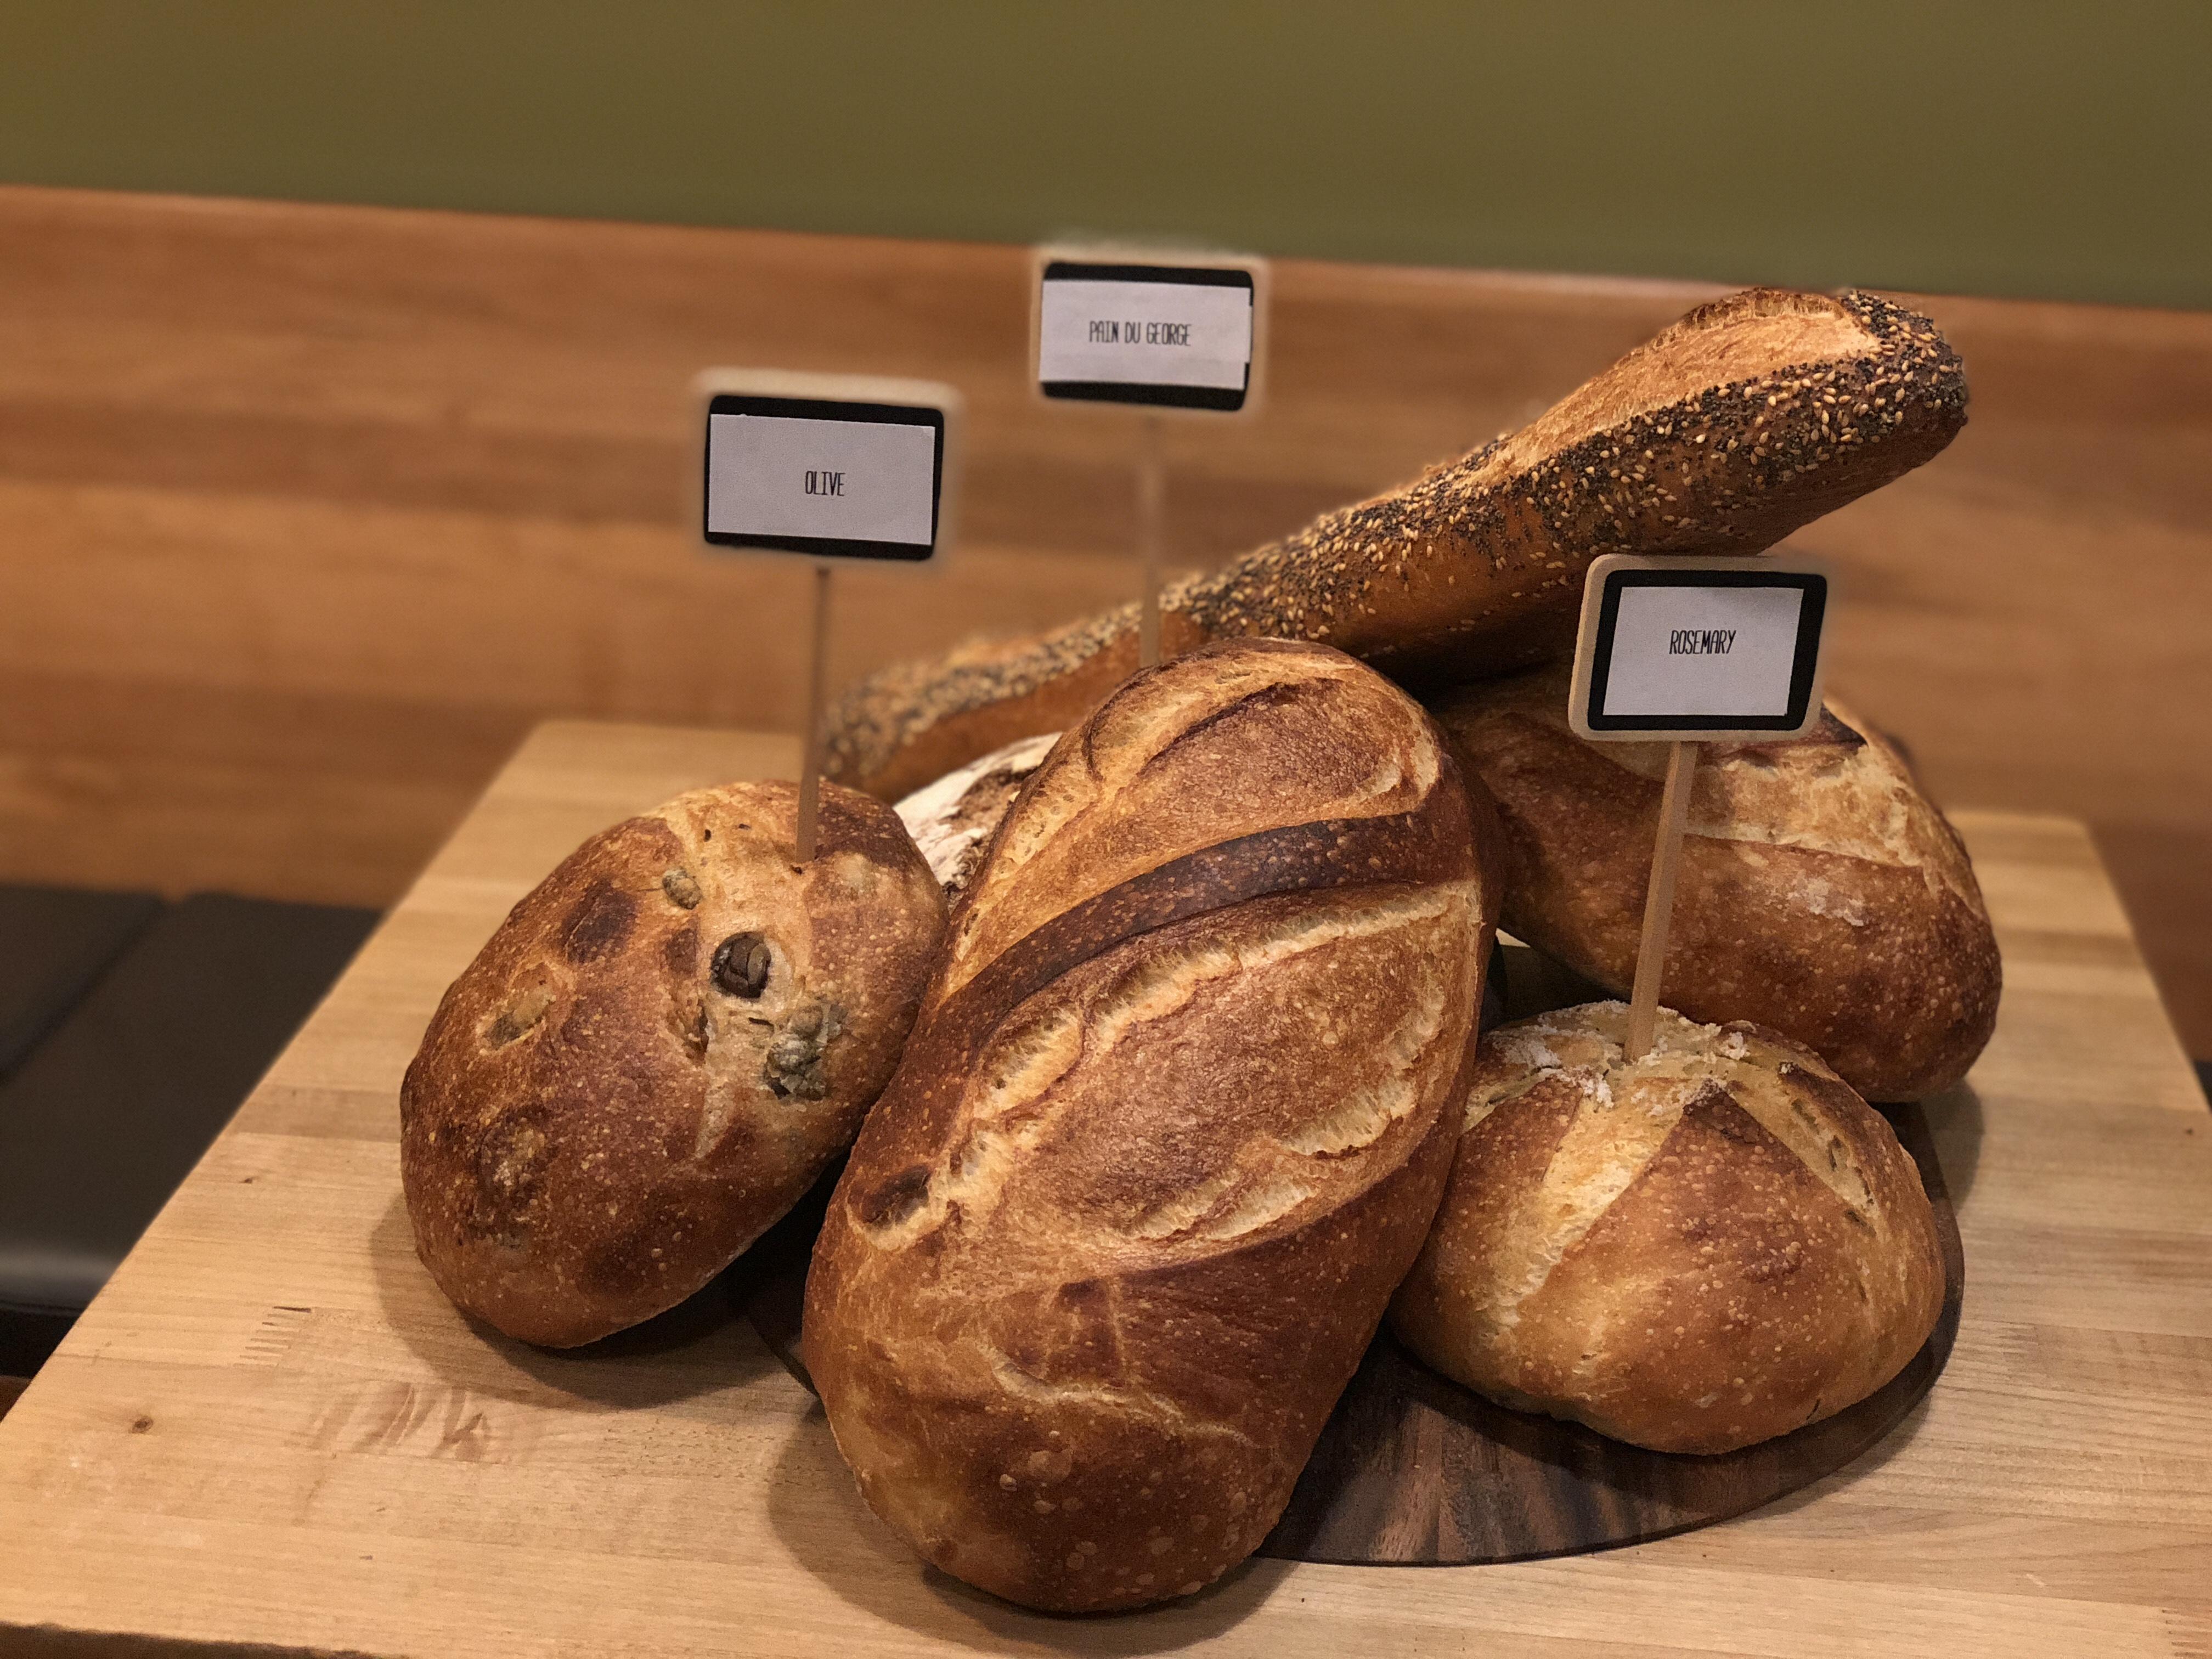 Do you love bread? Essential Bakery in Seattle has beautiful bread?